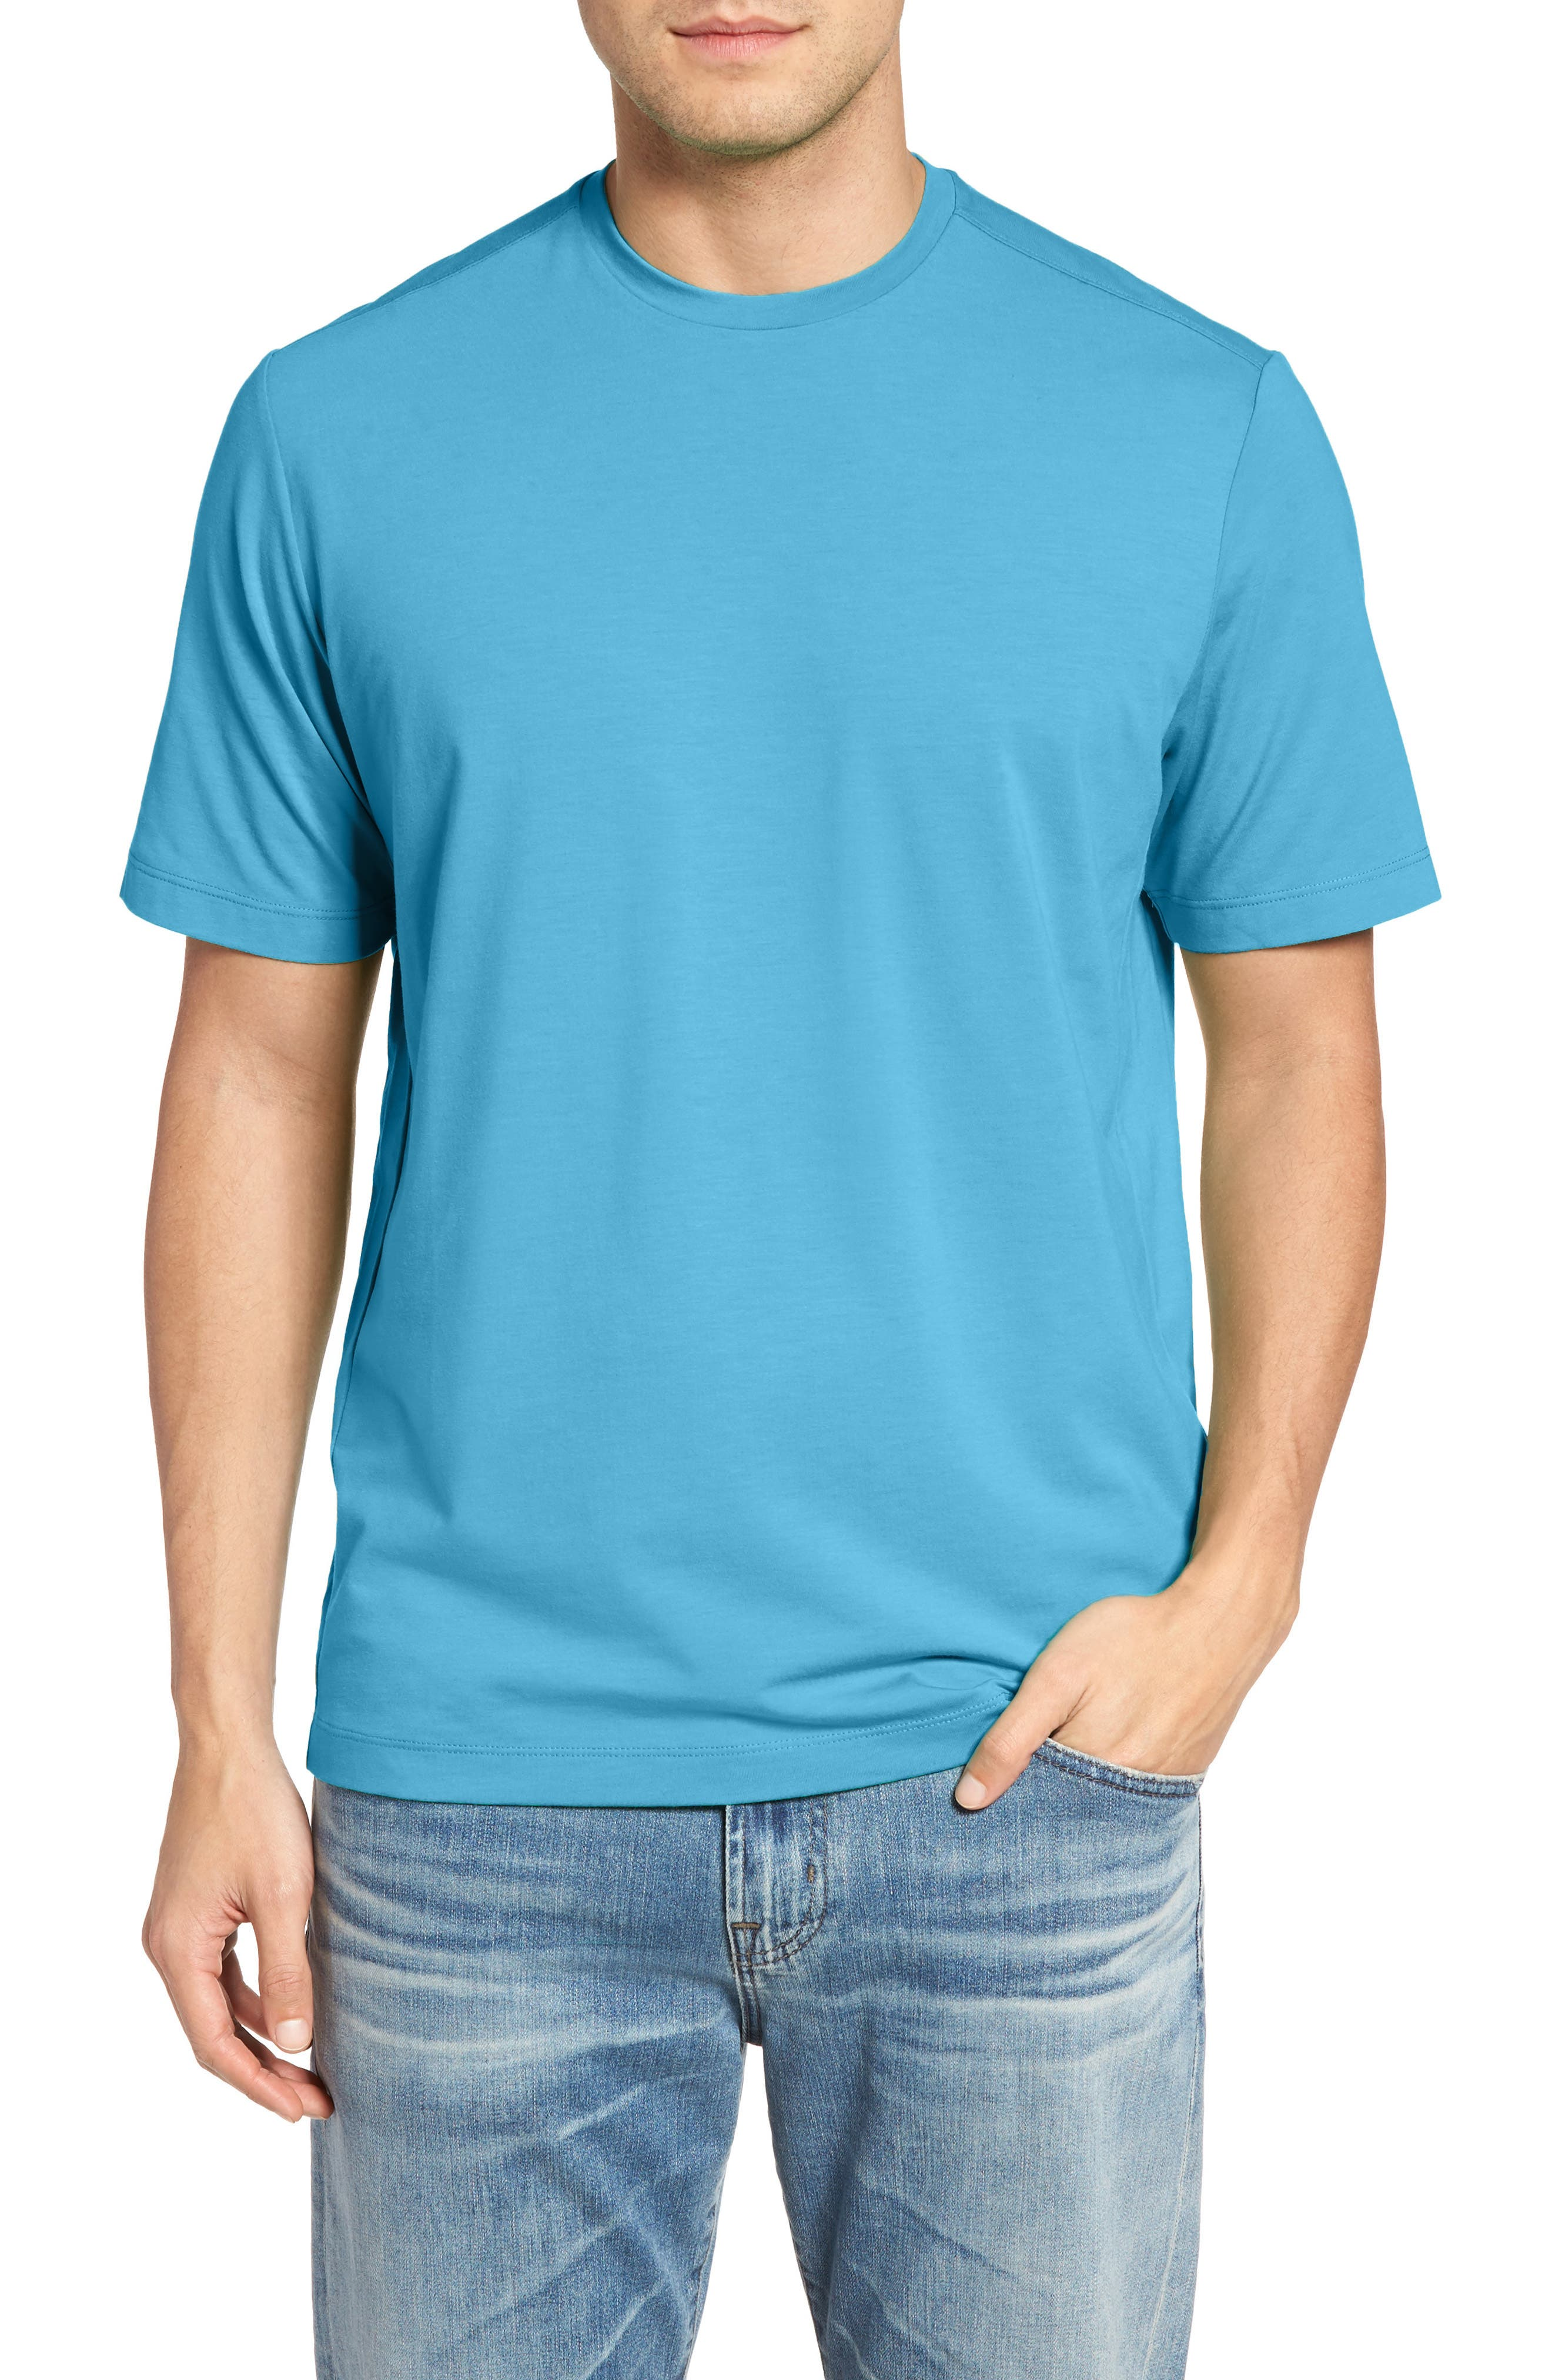 Tropicool T-Shirt,                             Main thumbnail 4, color,